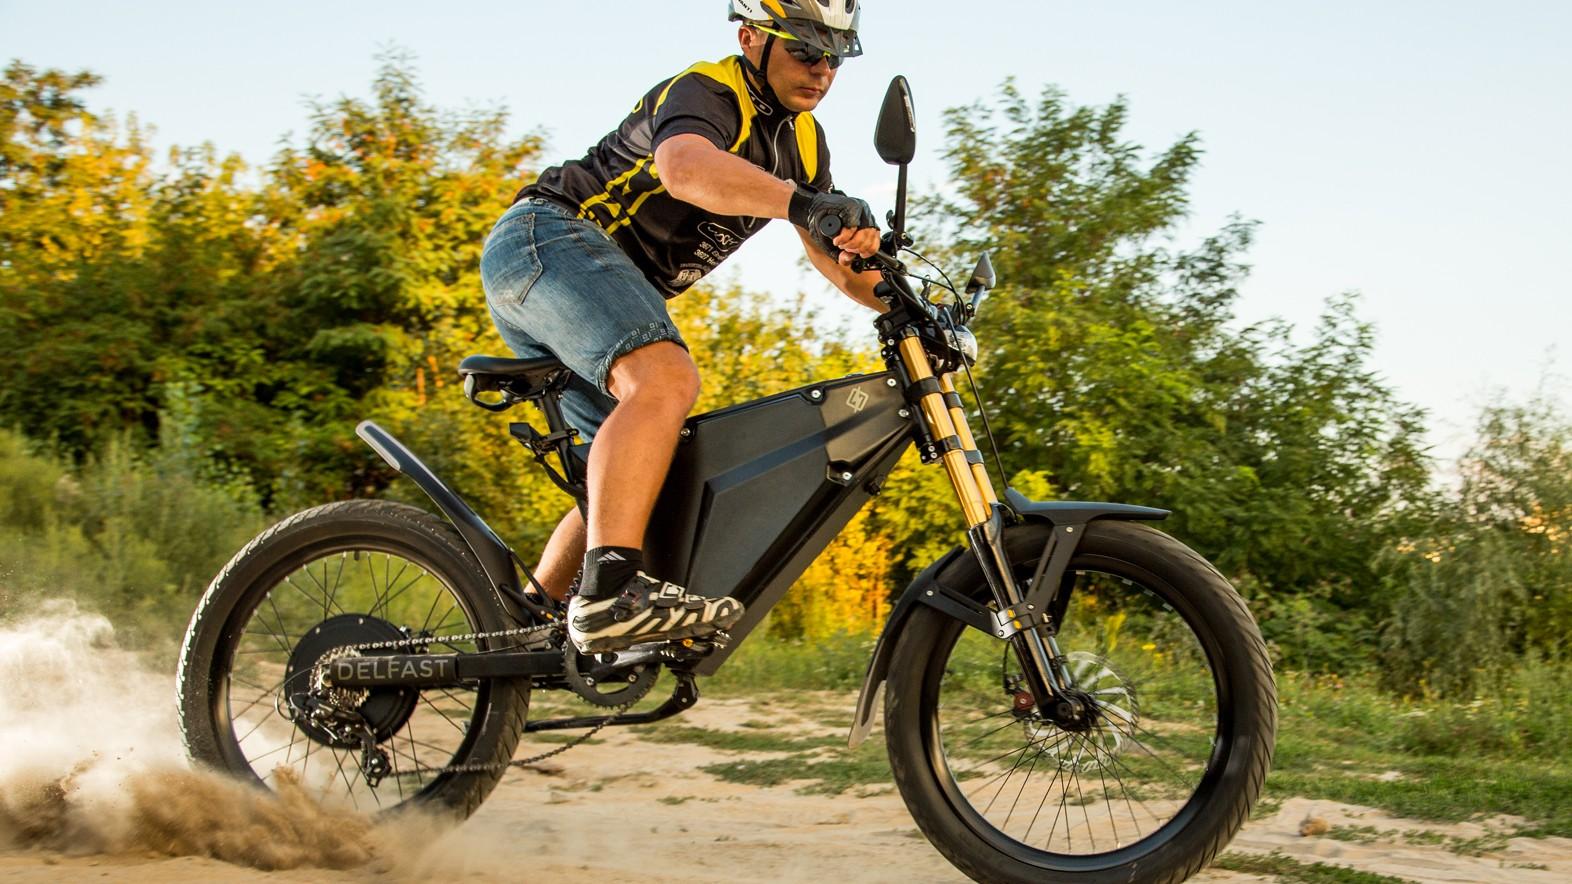 Delfast's electric bike has a claimed 380km (236m) range